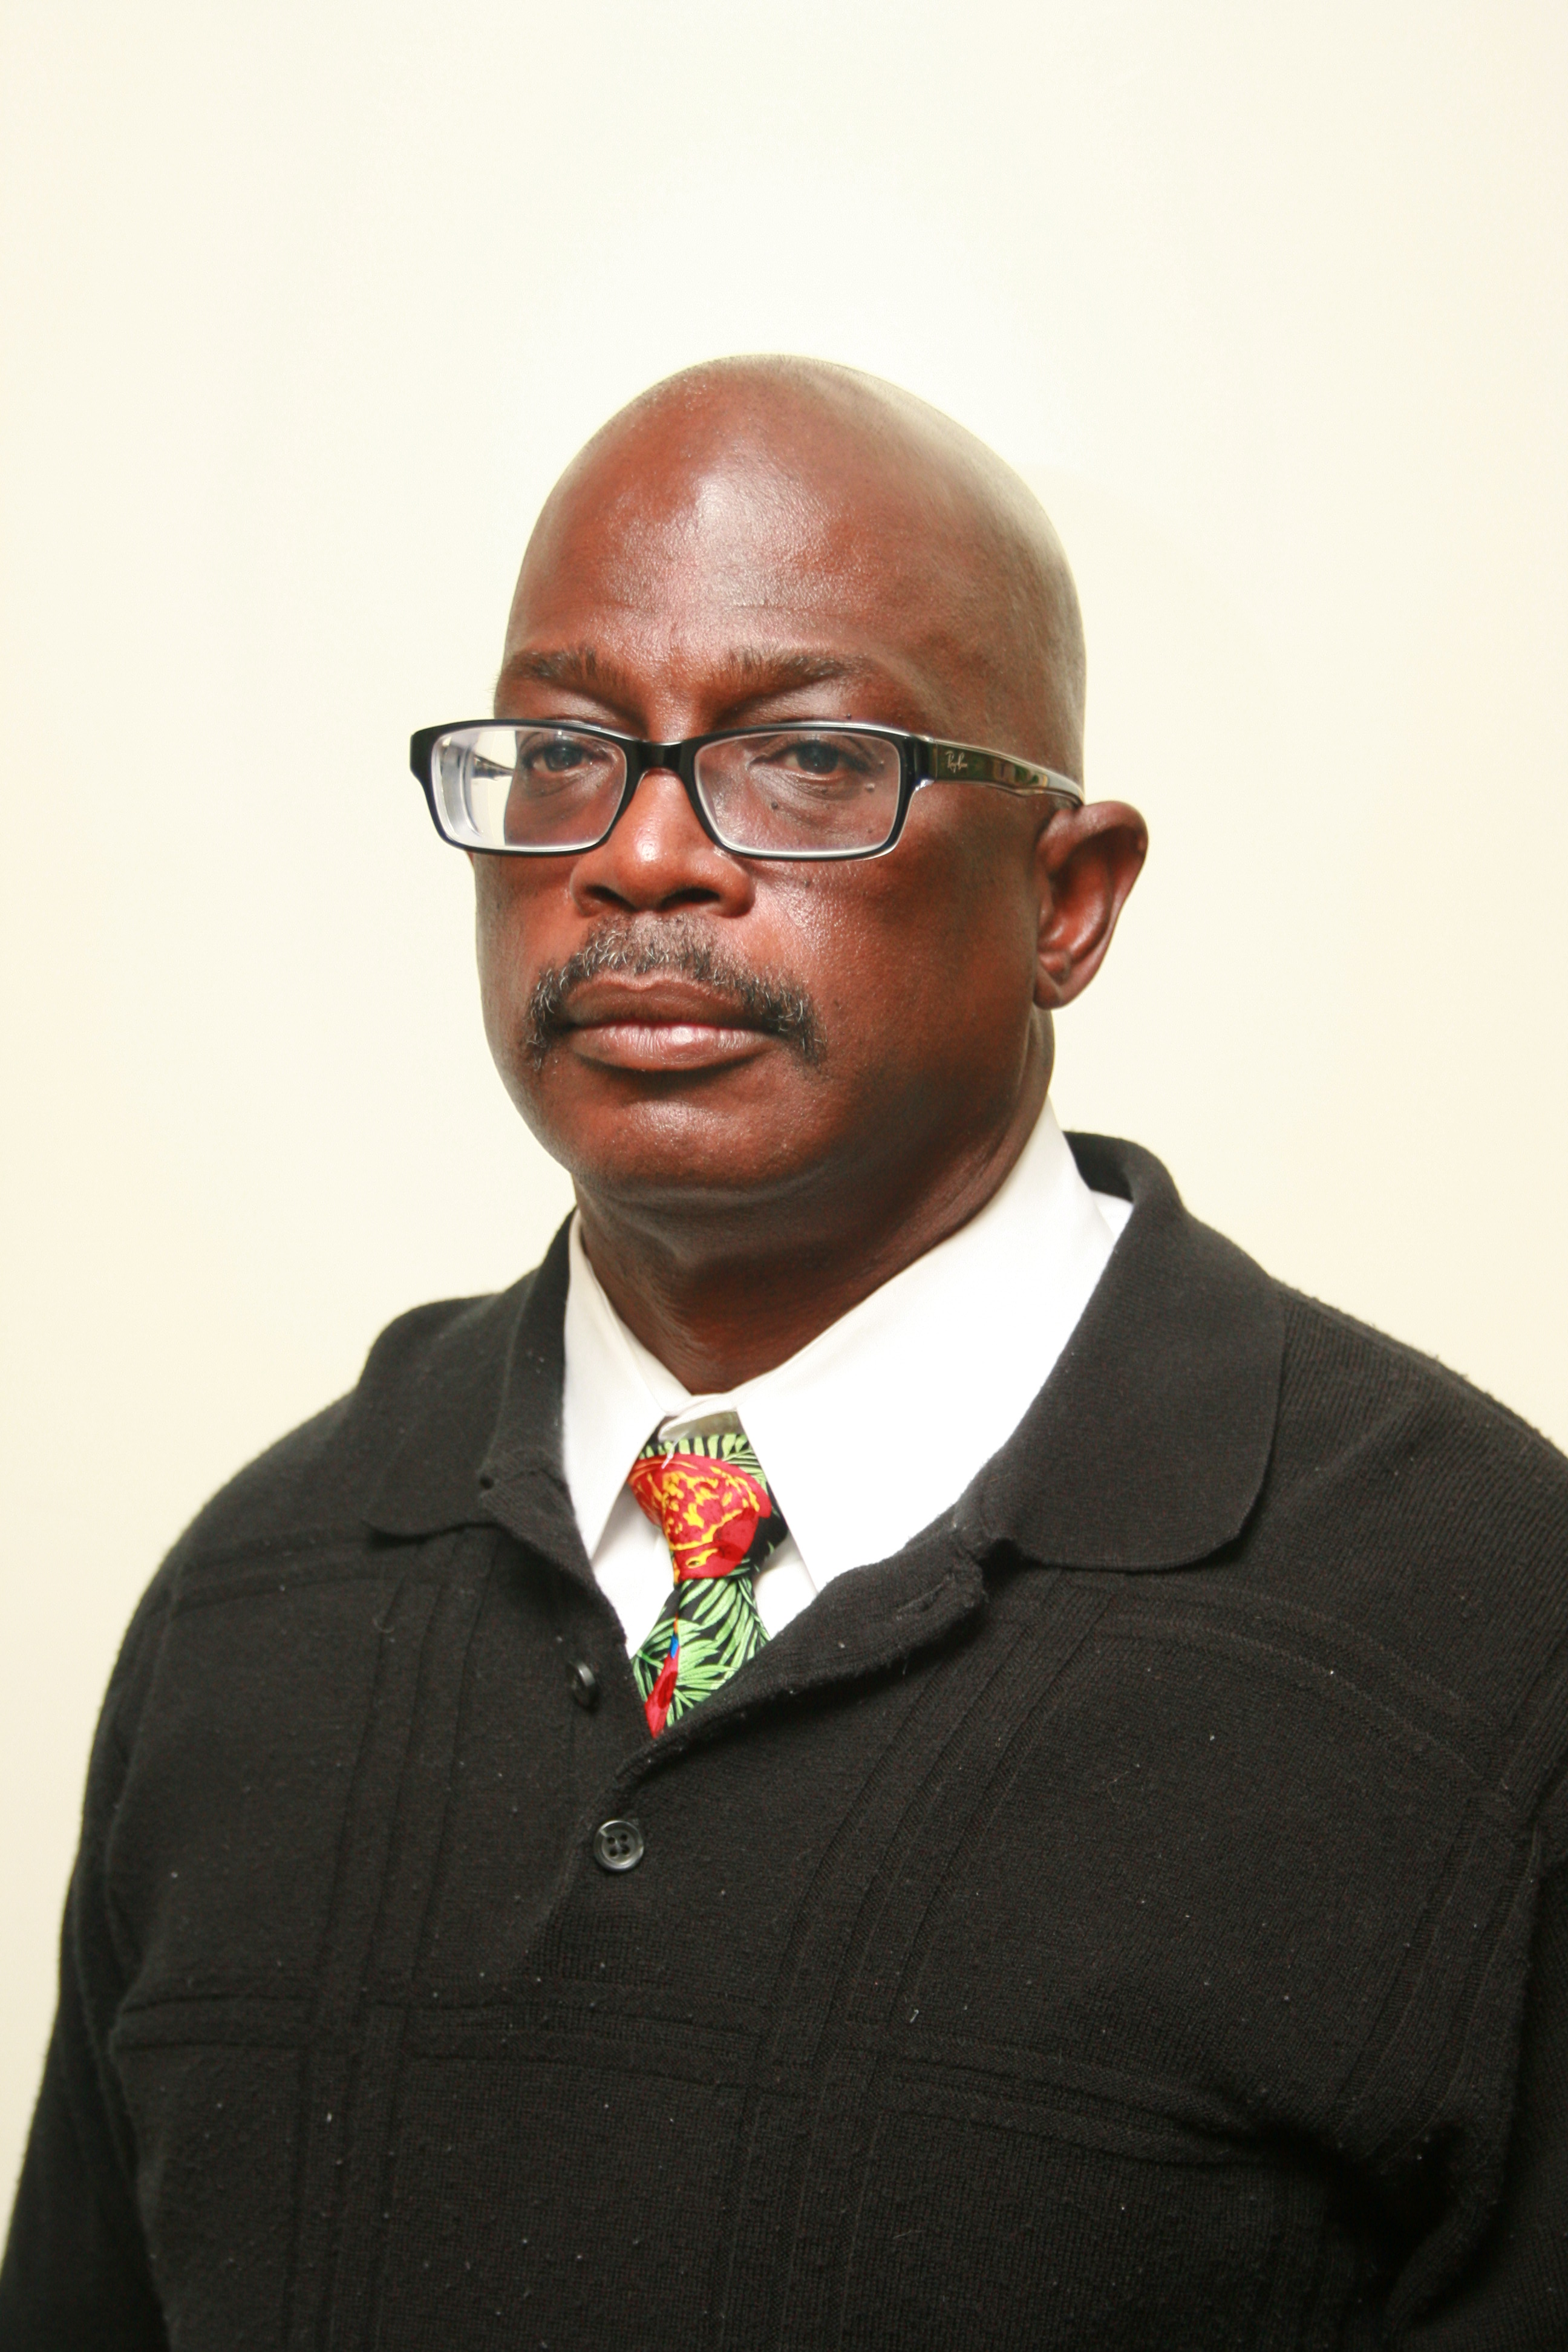 Kevin Terrell, Sr.